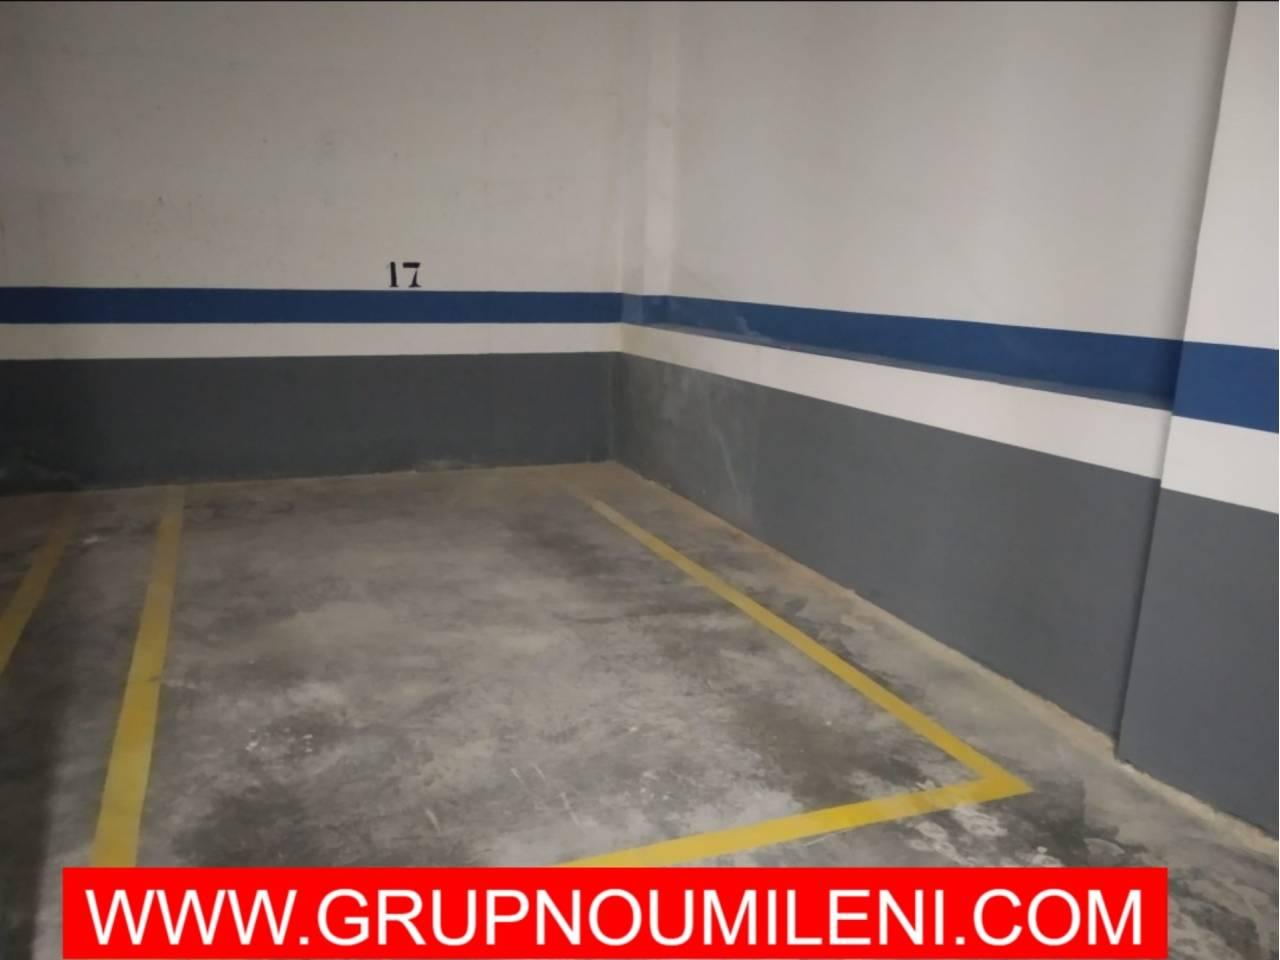 Location Parking voiture  Catarroja. Superficie total 12 m², garaje superficie útil 12 m², estado con